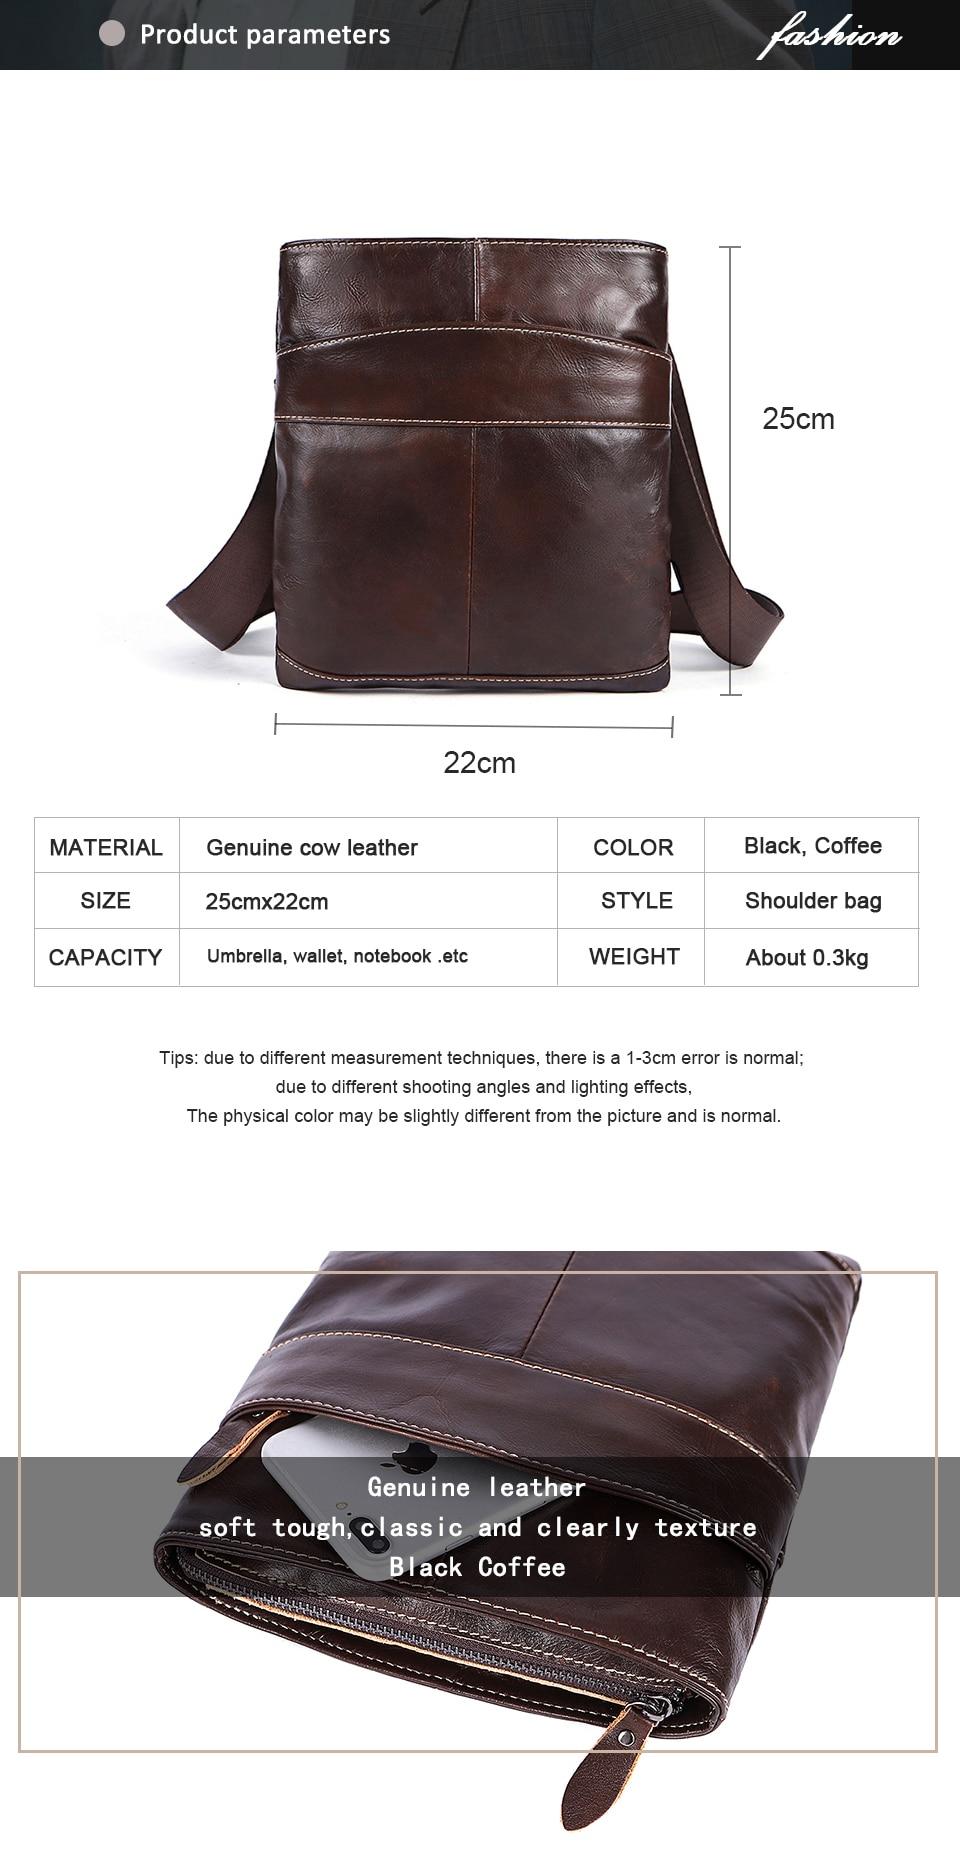 Genuine Leather Men Bag Men Messenger Bags Fashion ipad Flap Crossbody Bags Small Casual Men's Leather Shoulder Bag Man (1)